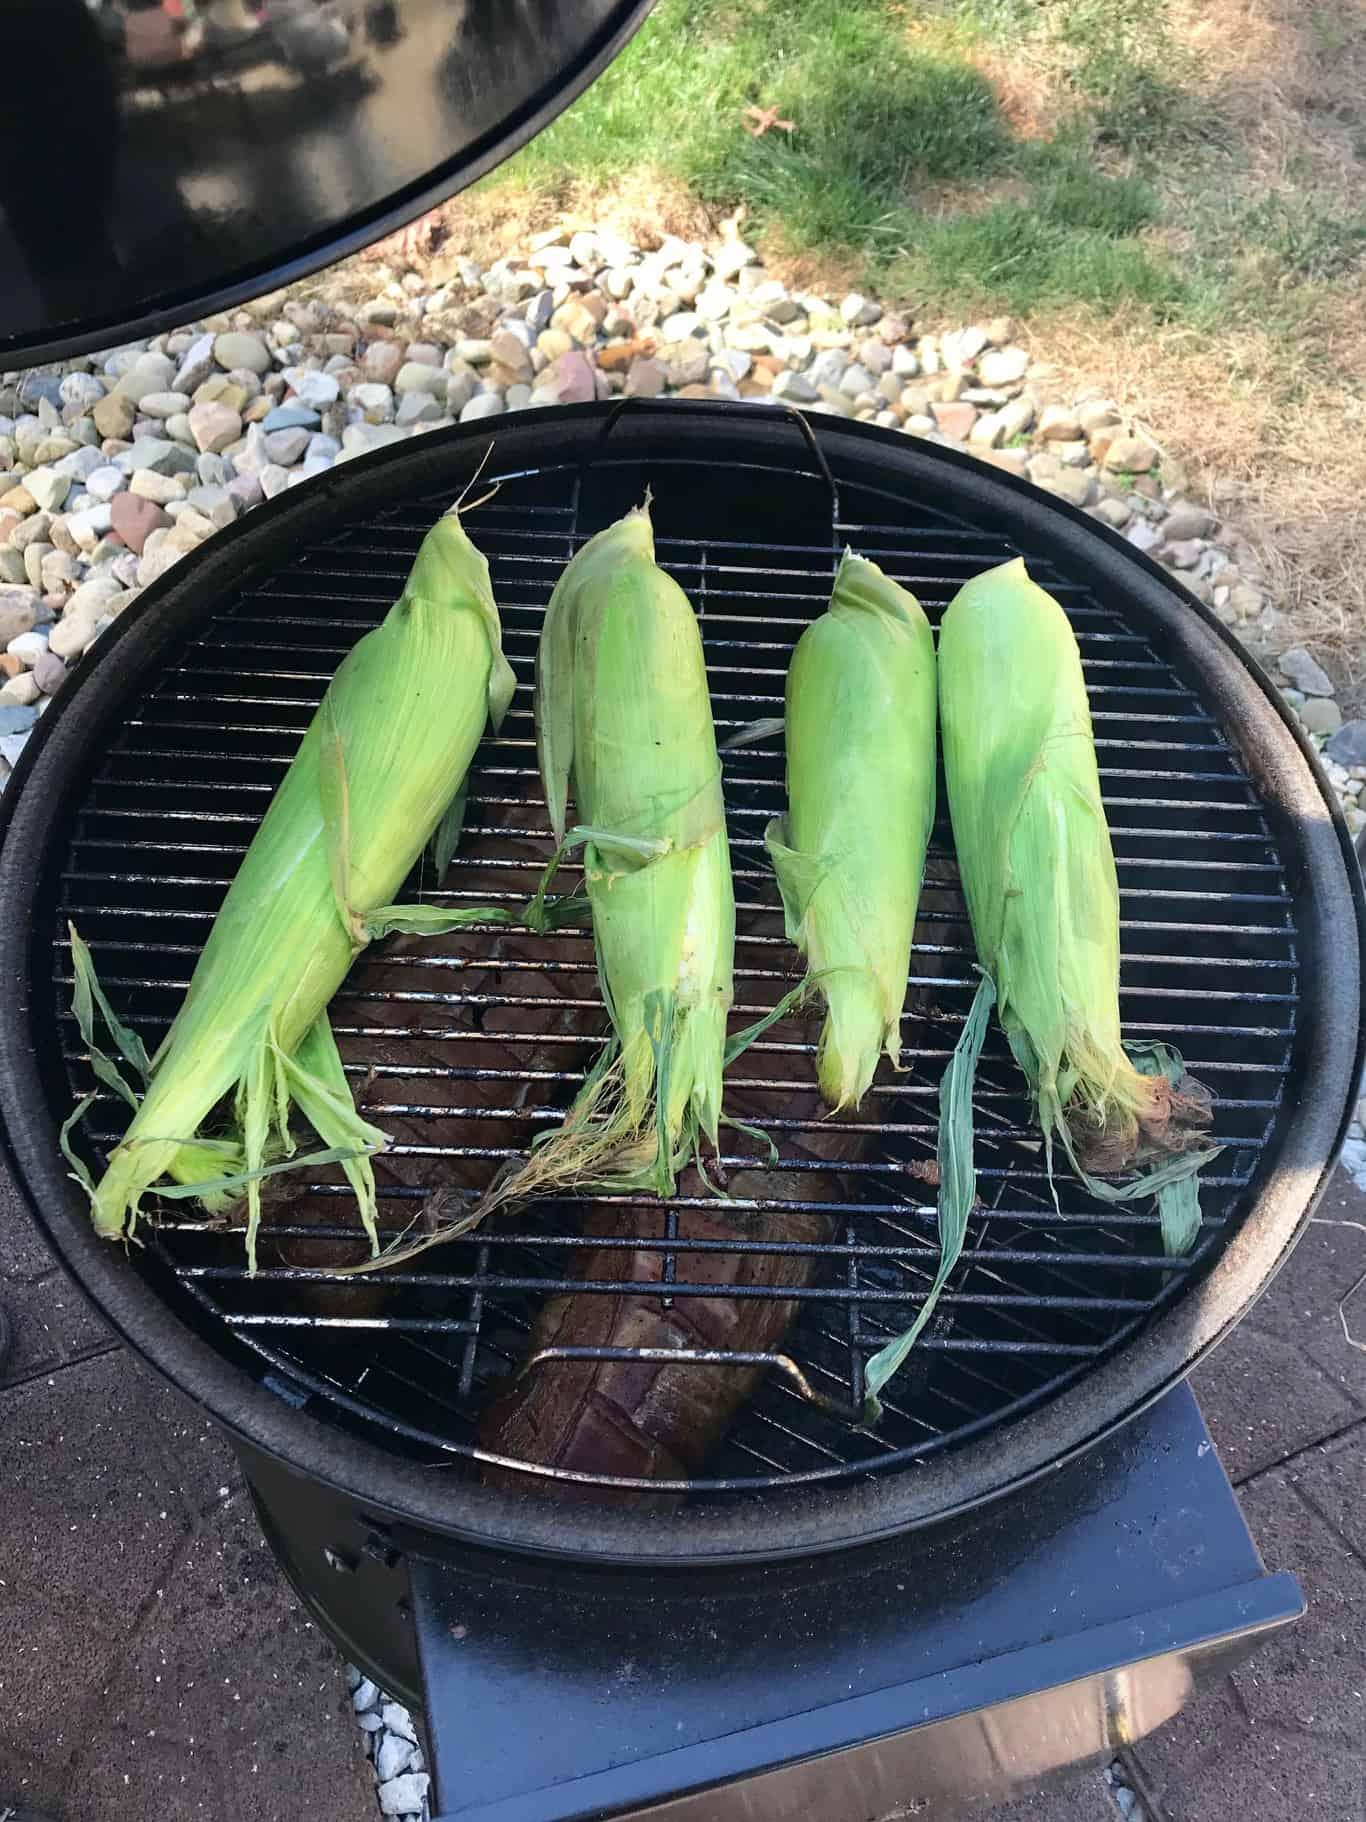 Corn on the cob still in husks on weber grill